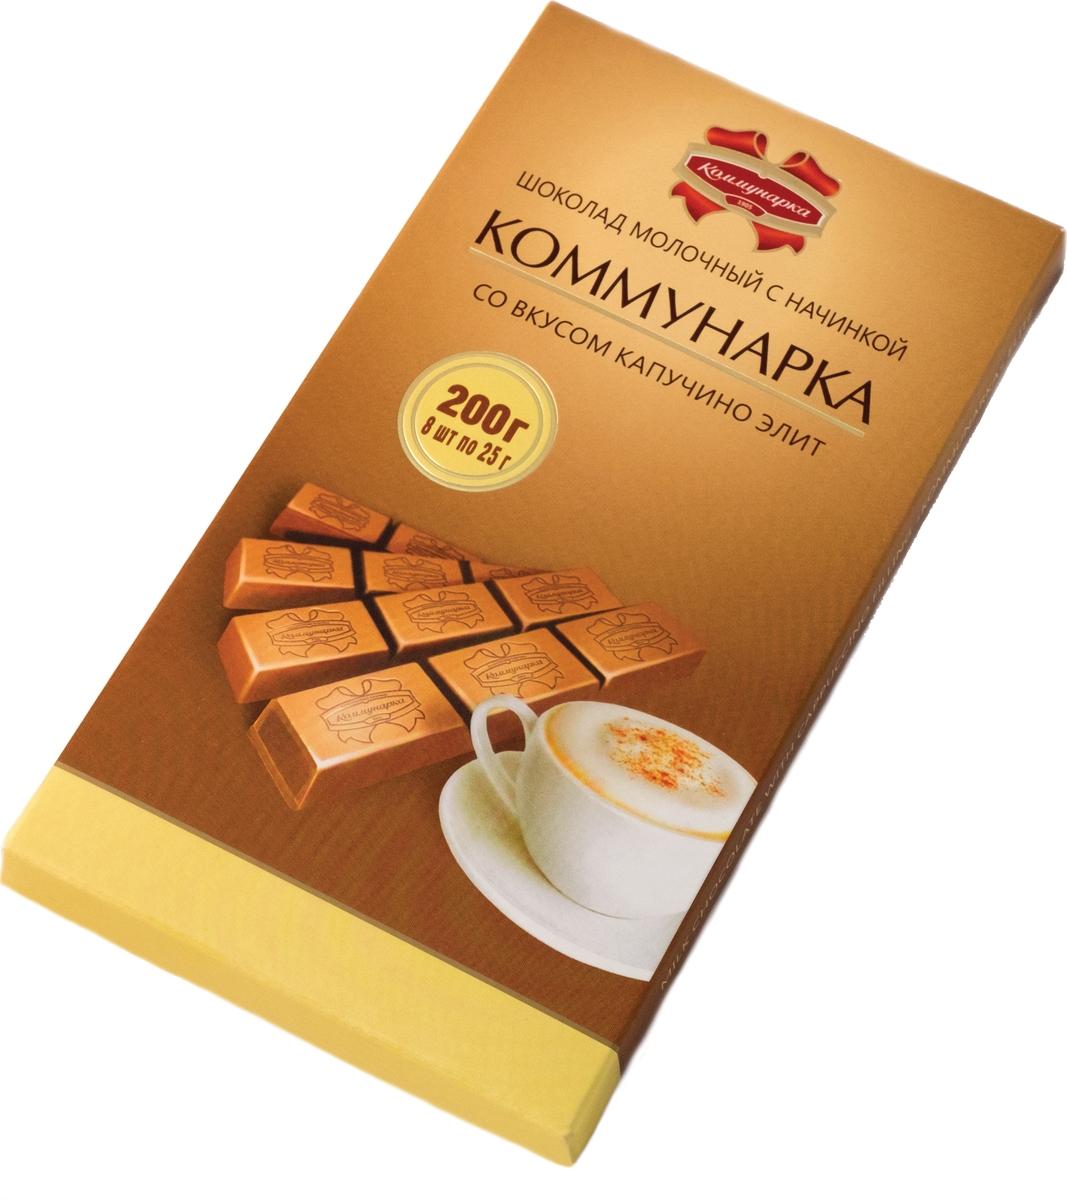 Коммунарка шоколад молочный со вкусом капучино элит, 200 г alpen gold шоколад молочный с начинкой со вкусом капучино 90 г